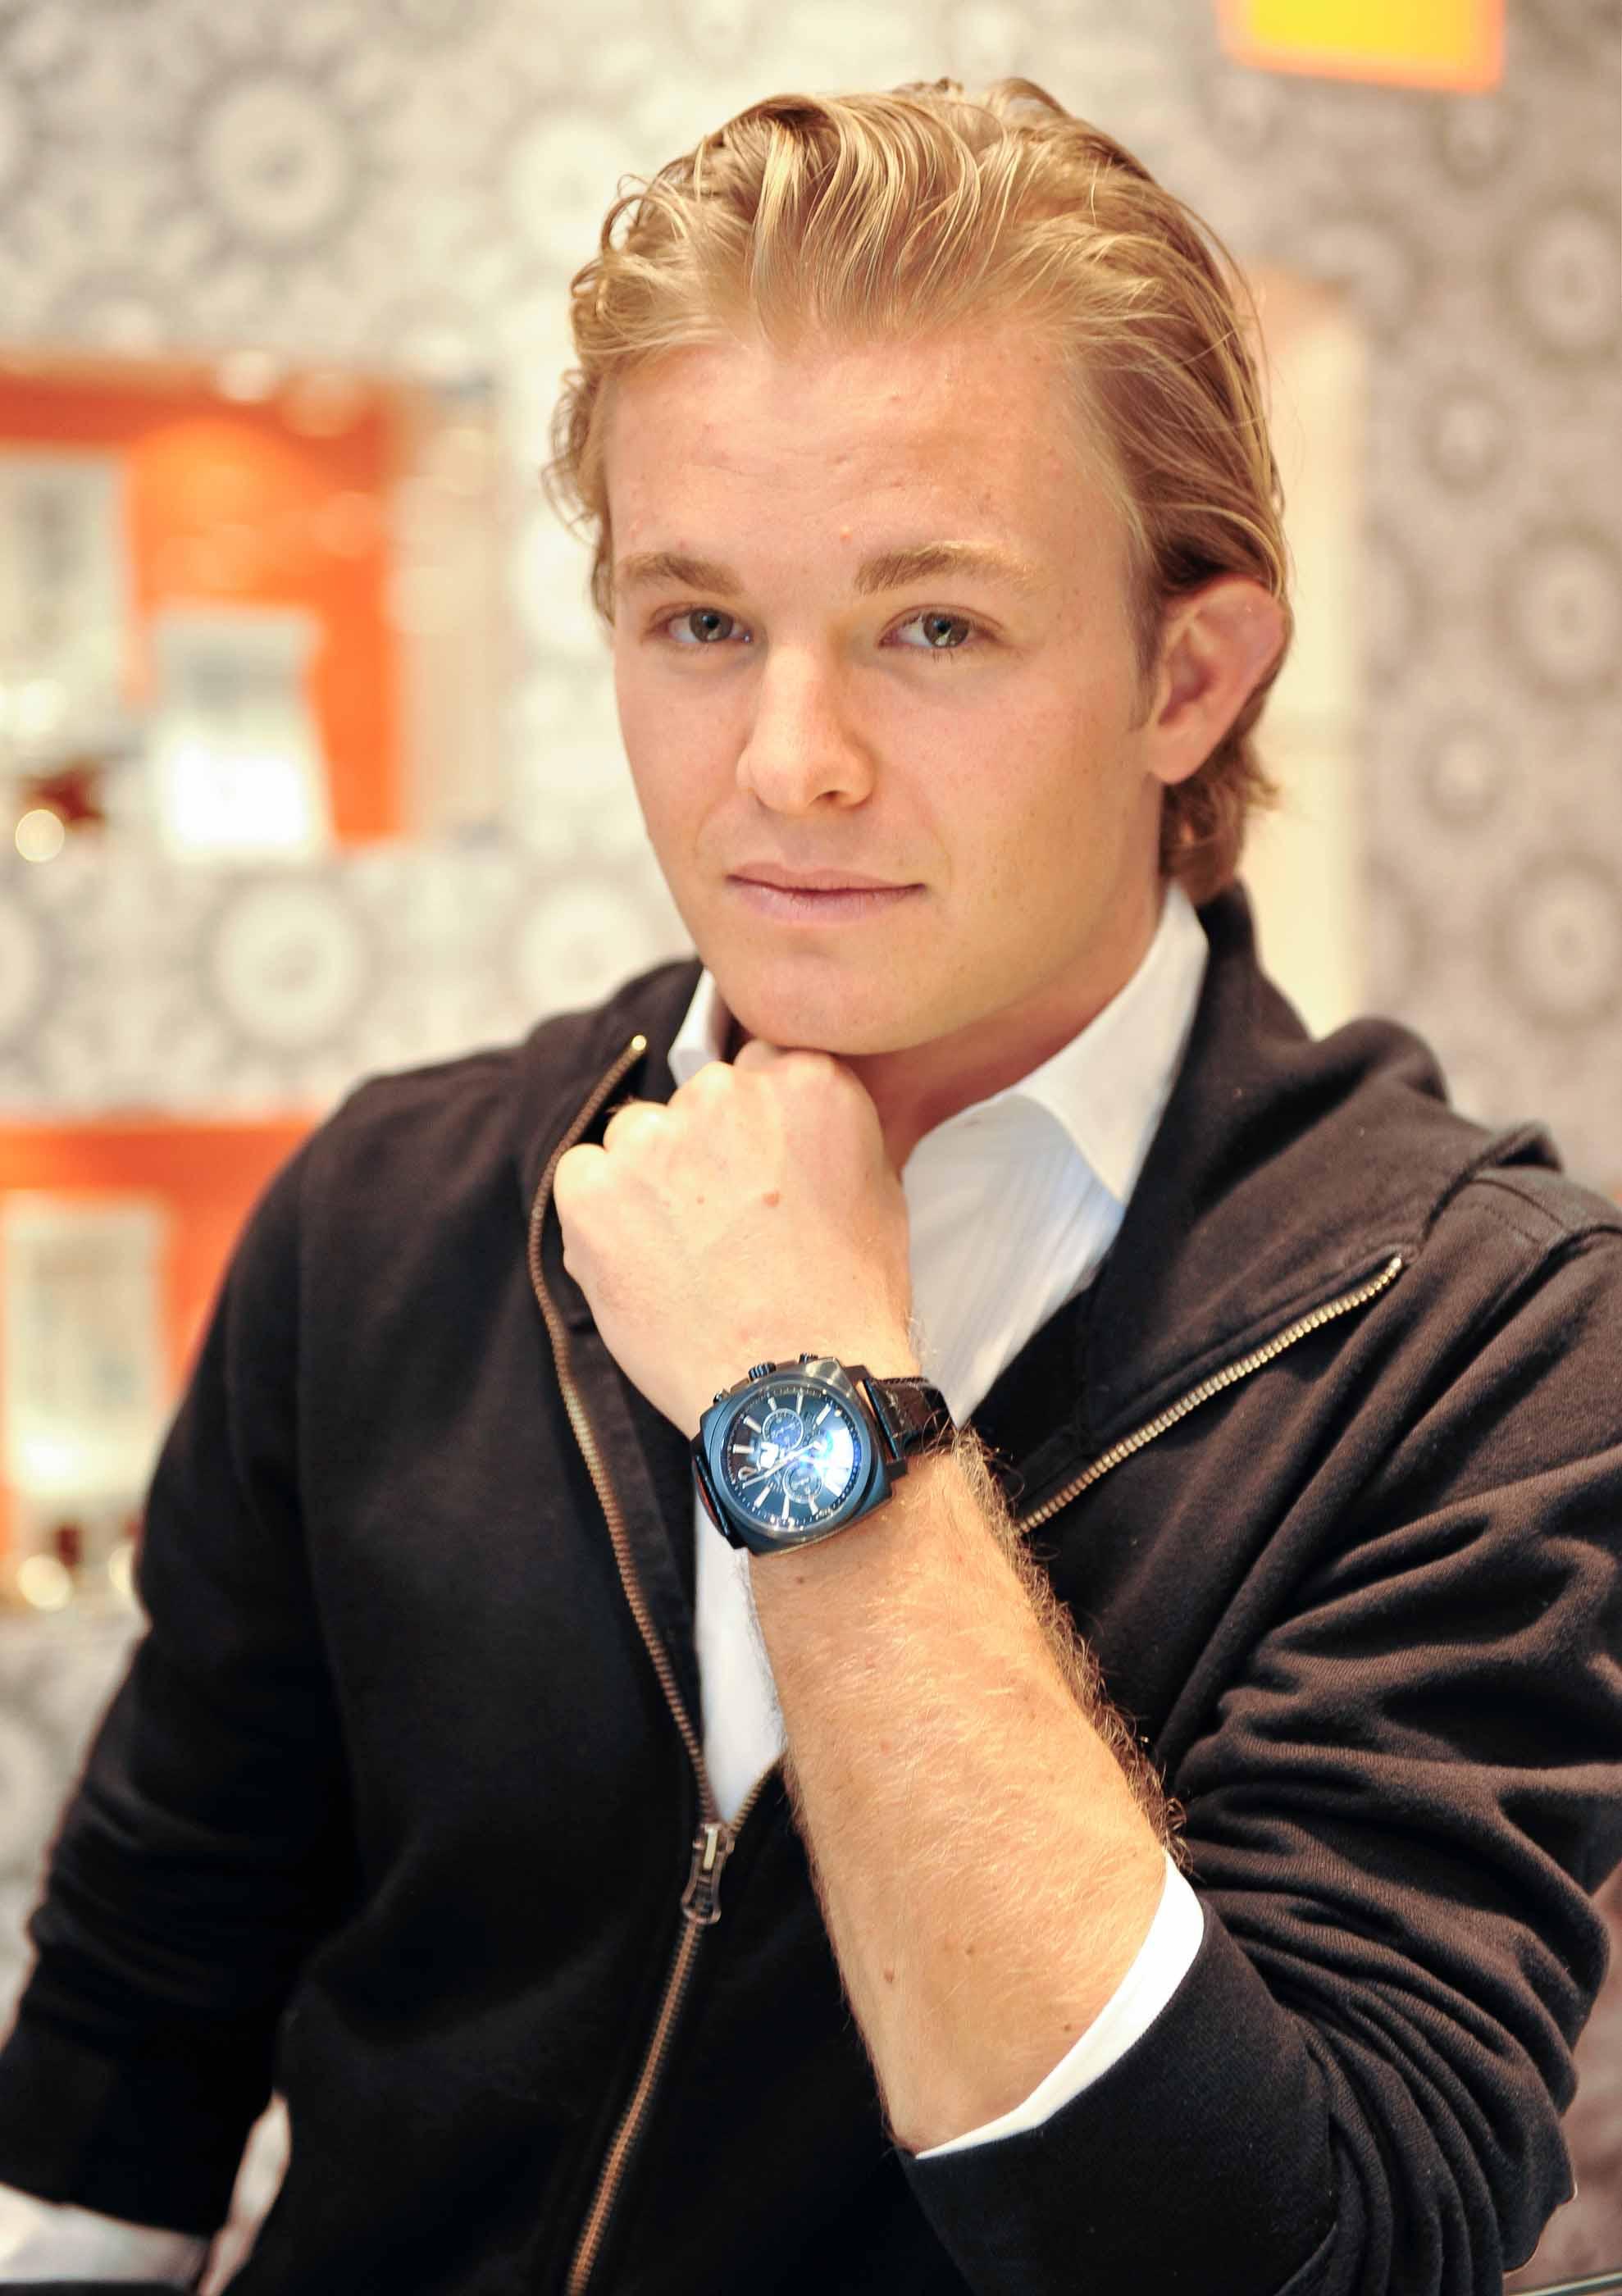 002_Nico_Rosberg_2 12